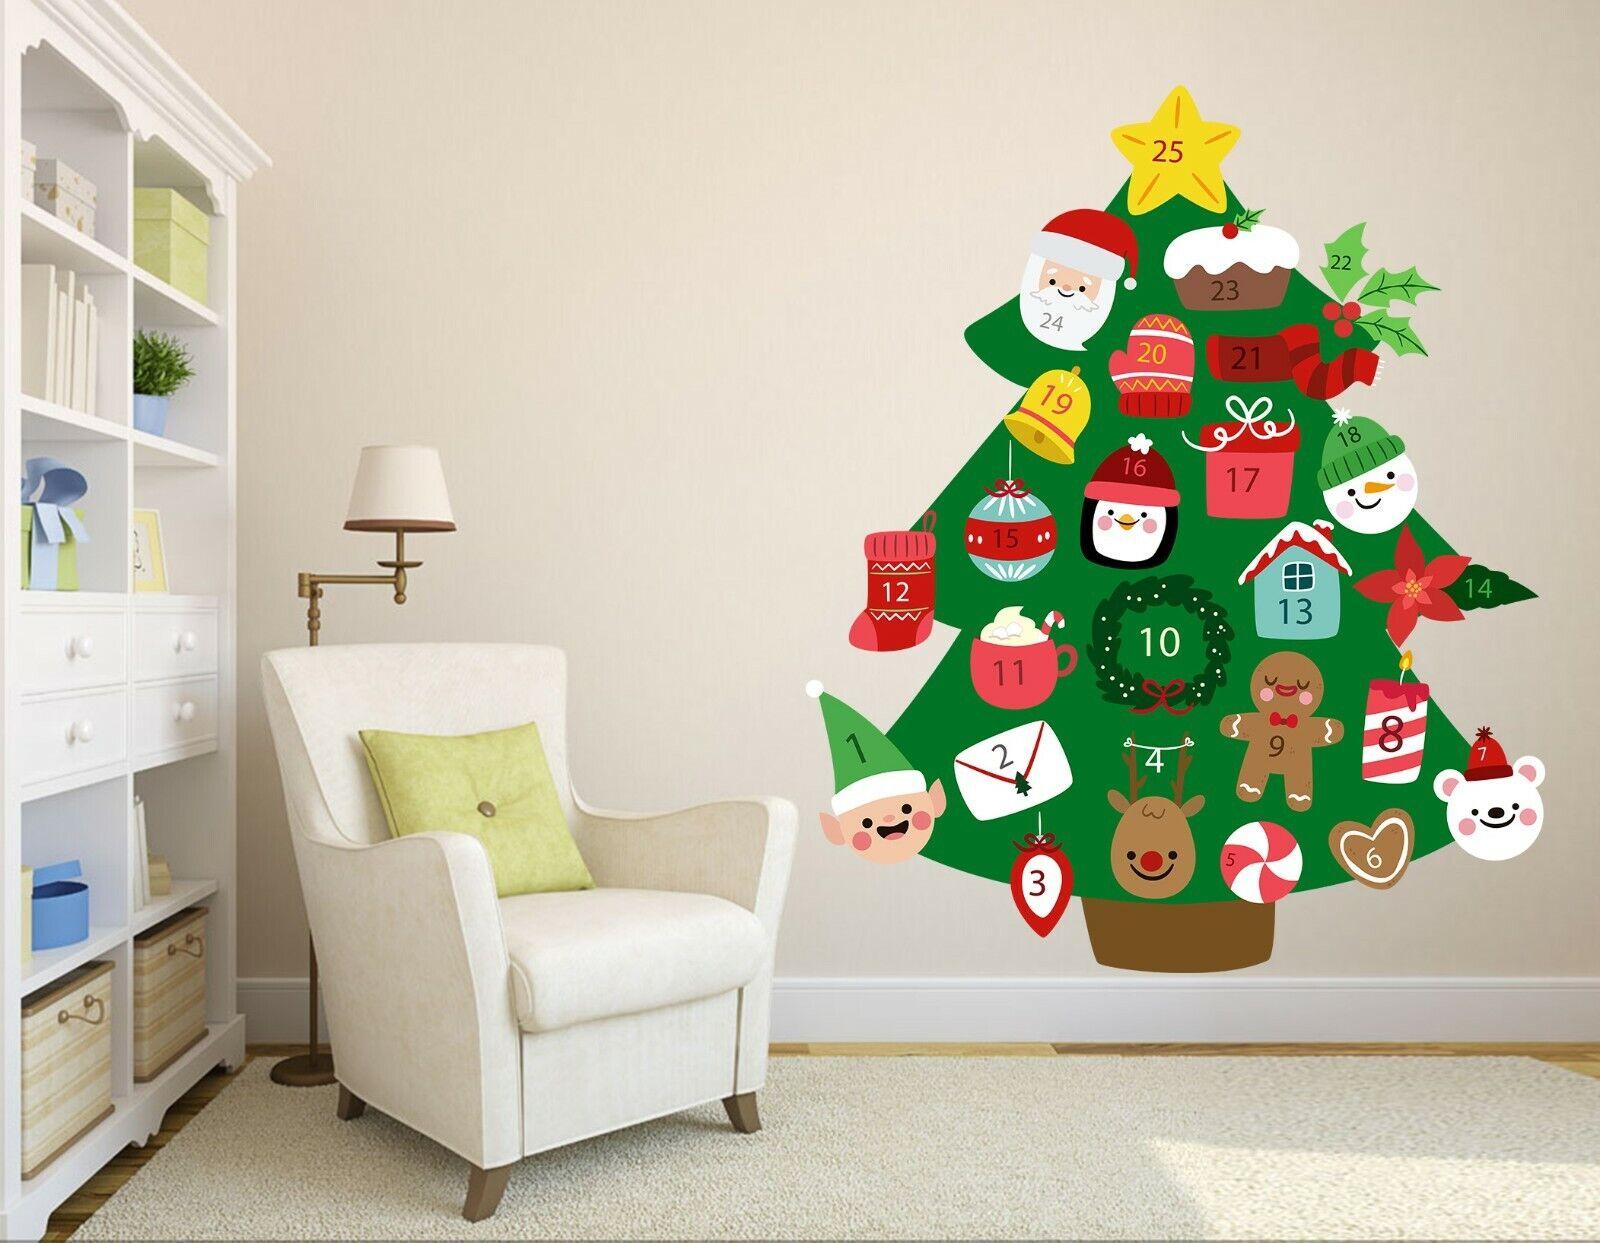 3D Christmas Tree B17 Christmas Wallpaper Murals Wall Print Decal Wall Zoe